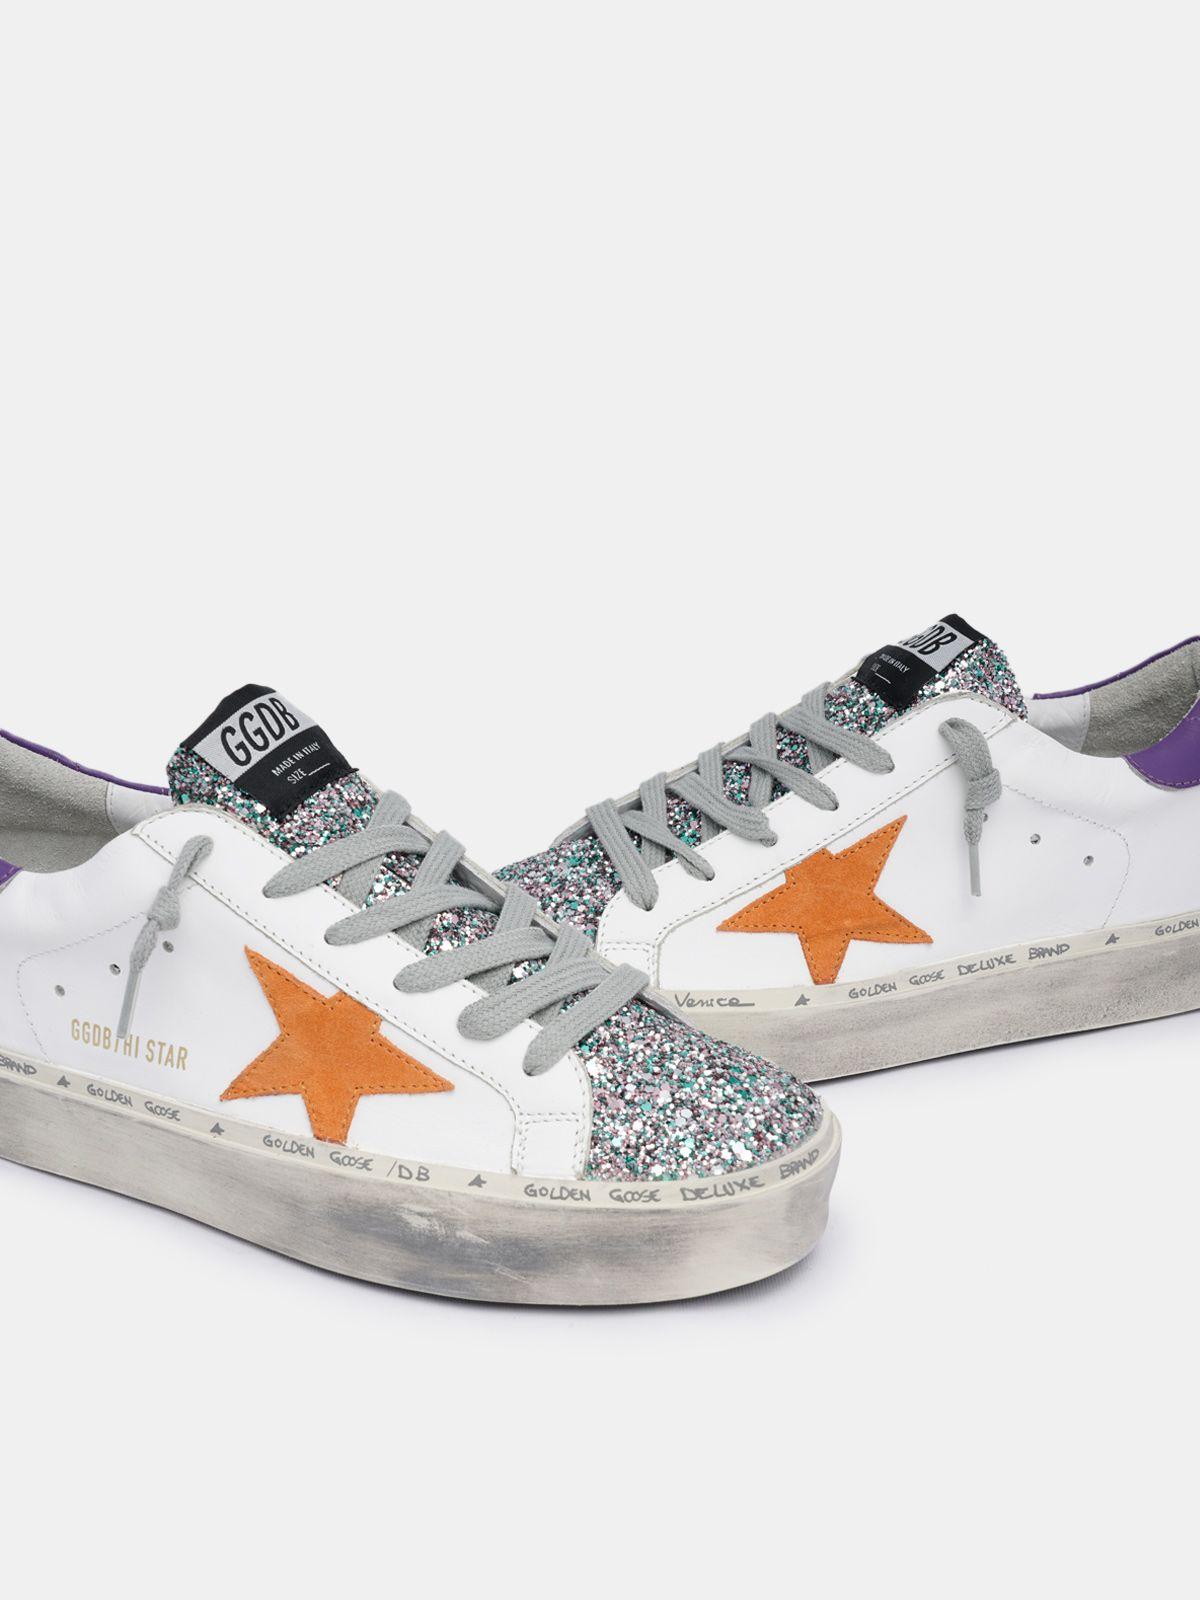 Golden Goose - White Hi Star sneakers with glitter insert in